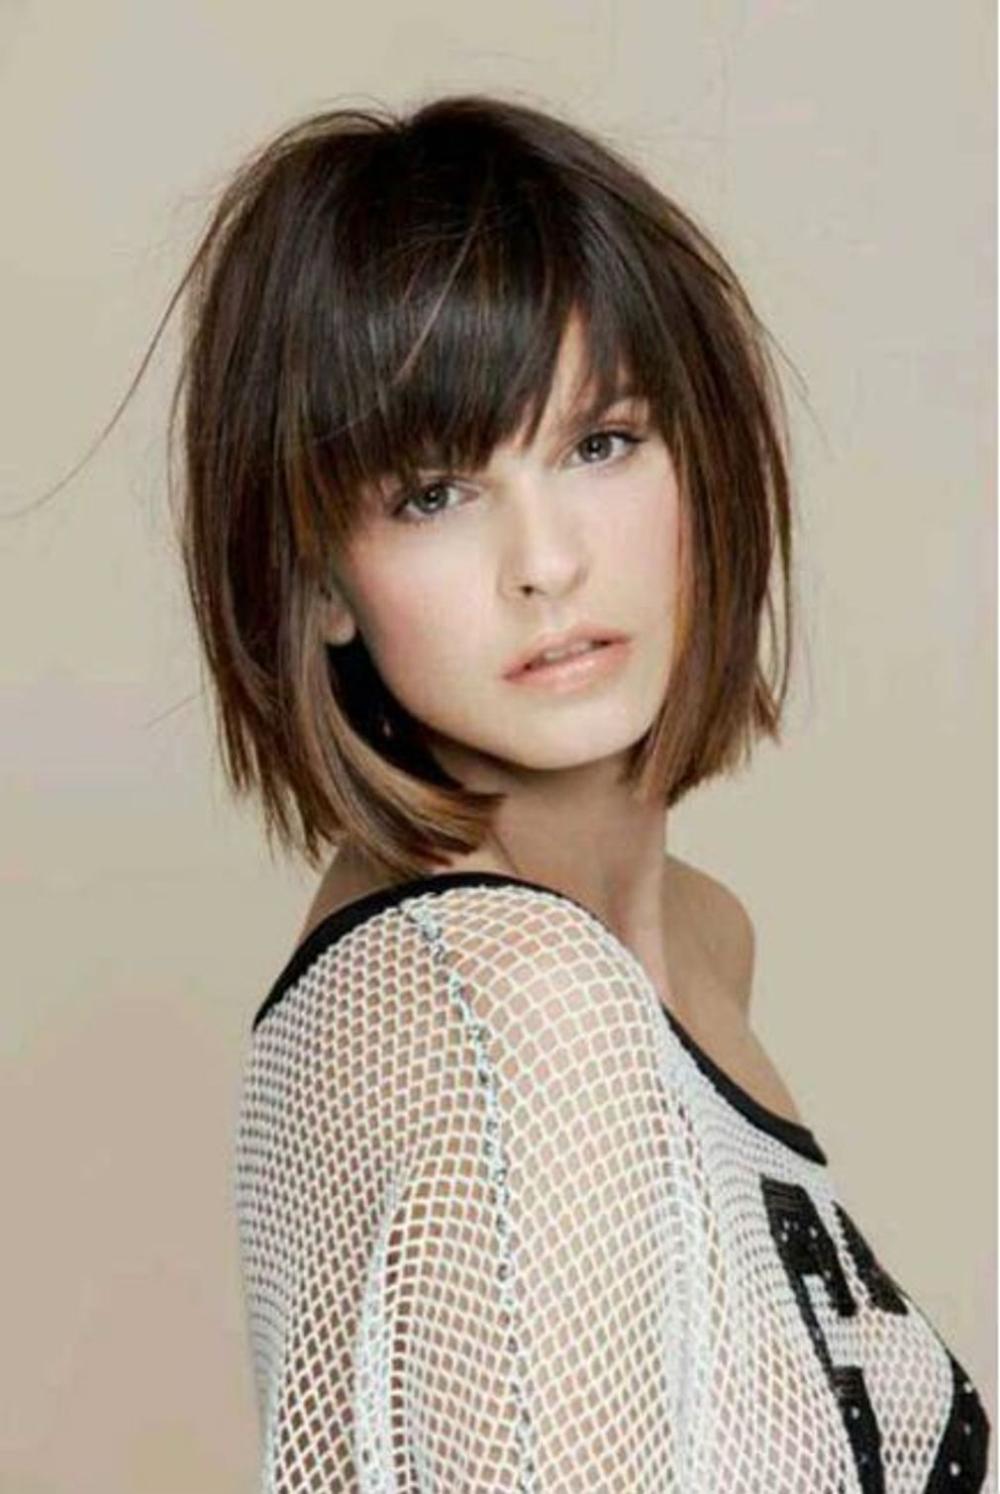 Les Plus Belles Coupes Carre Thick Hair Styles Straight Bob Hairstyles Layered Bob Hairstyles